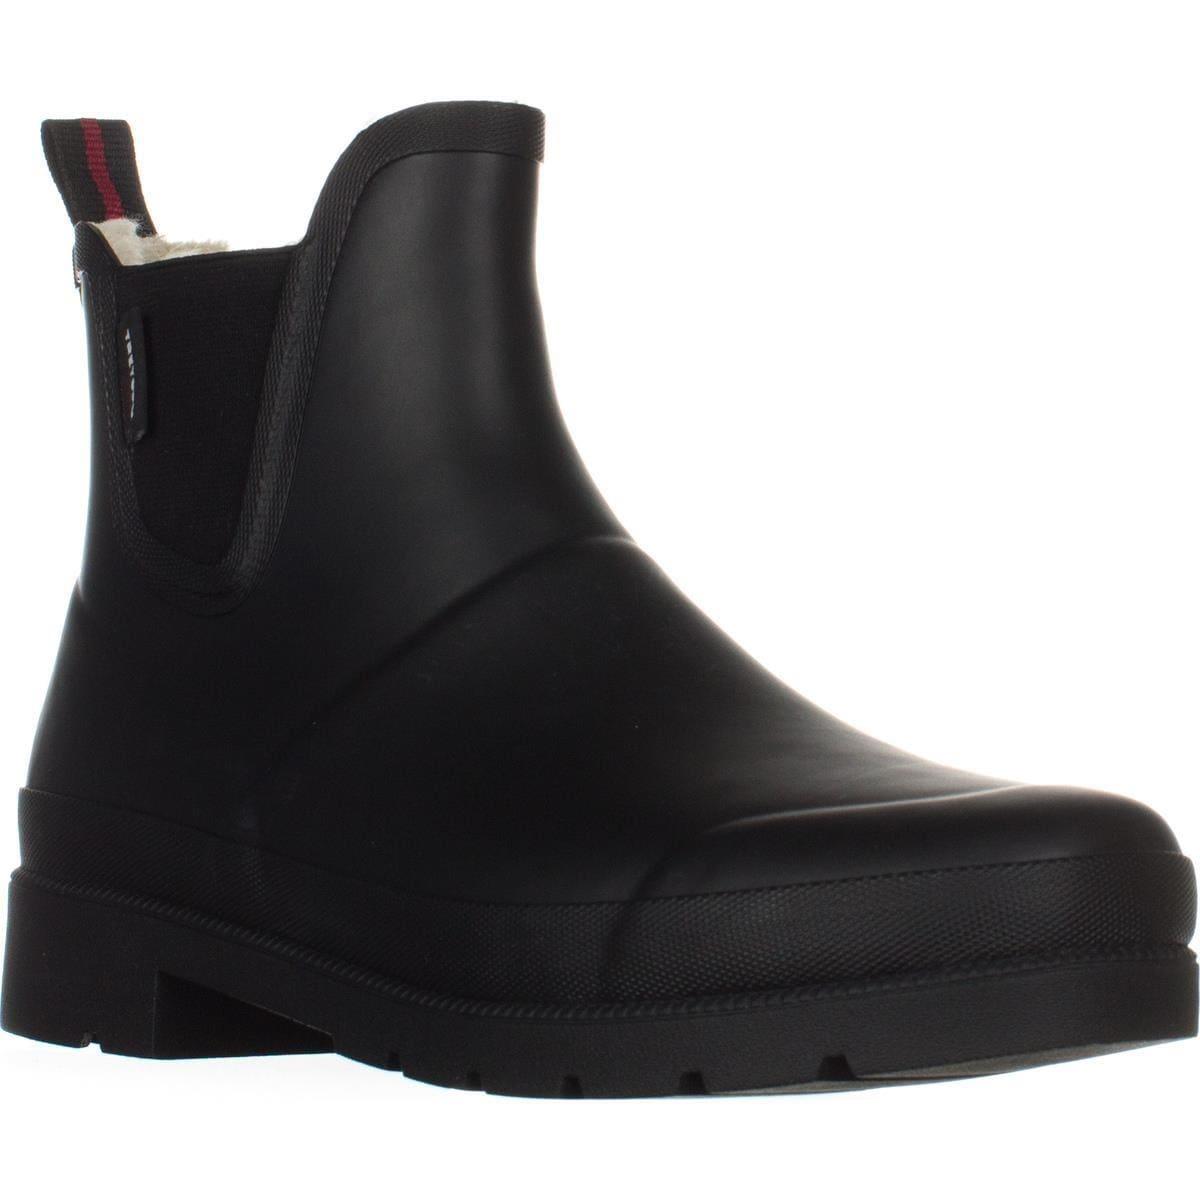 Tretorn Lina Winter Rain Boots